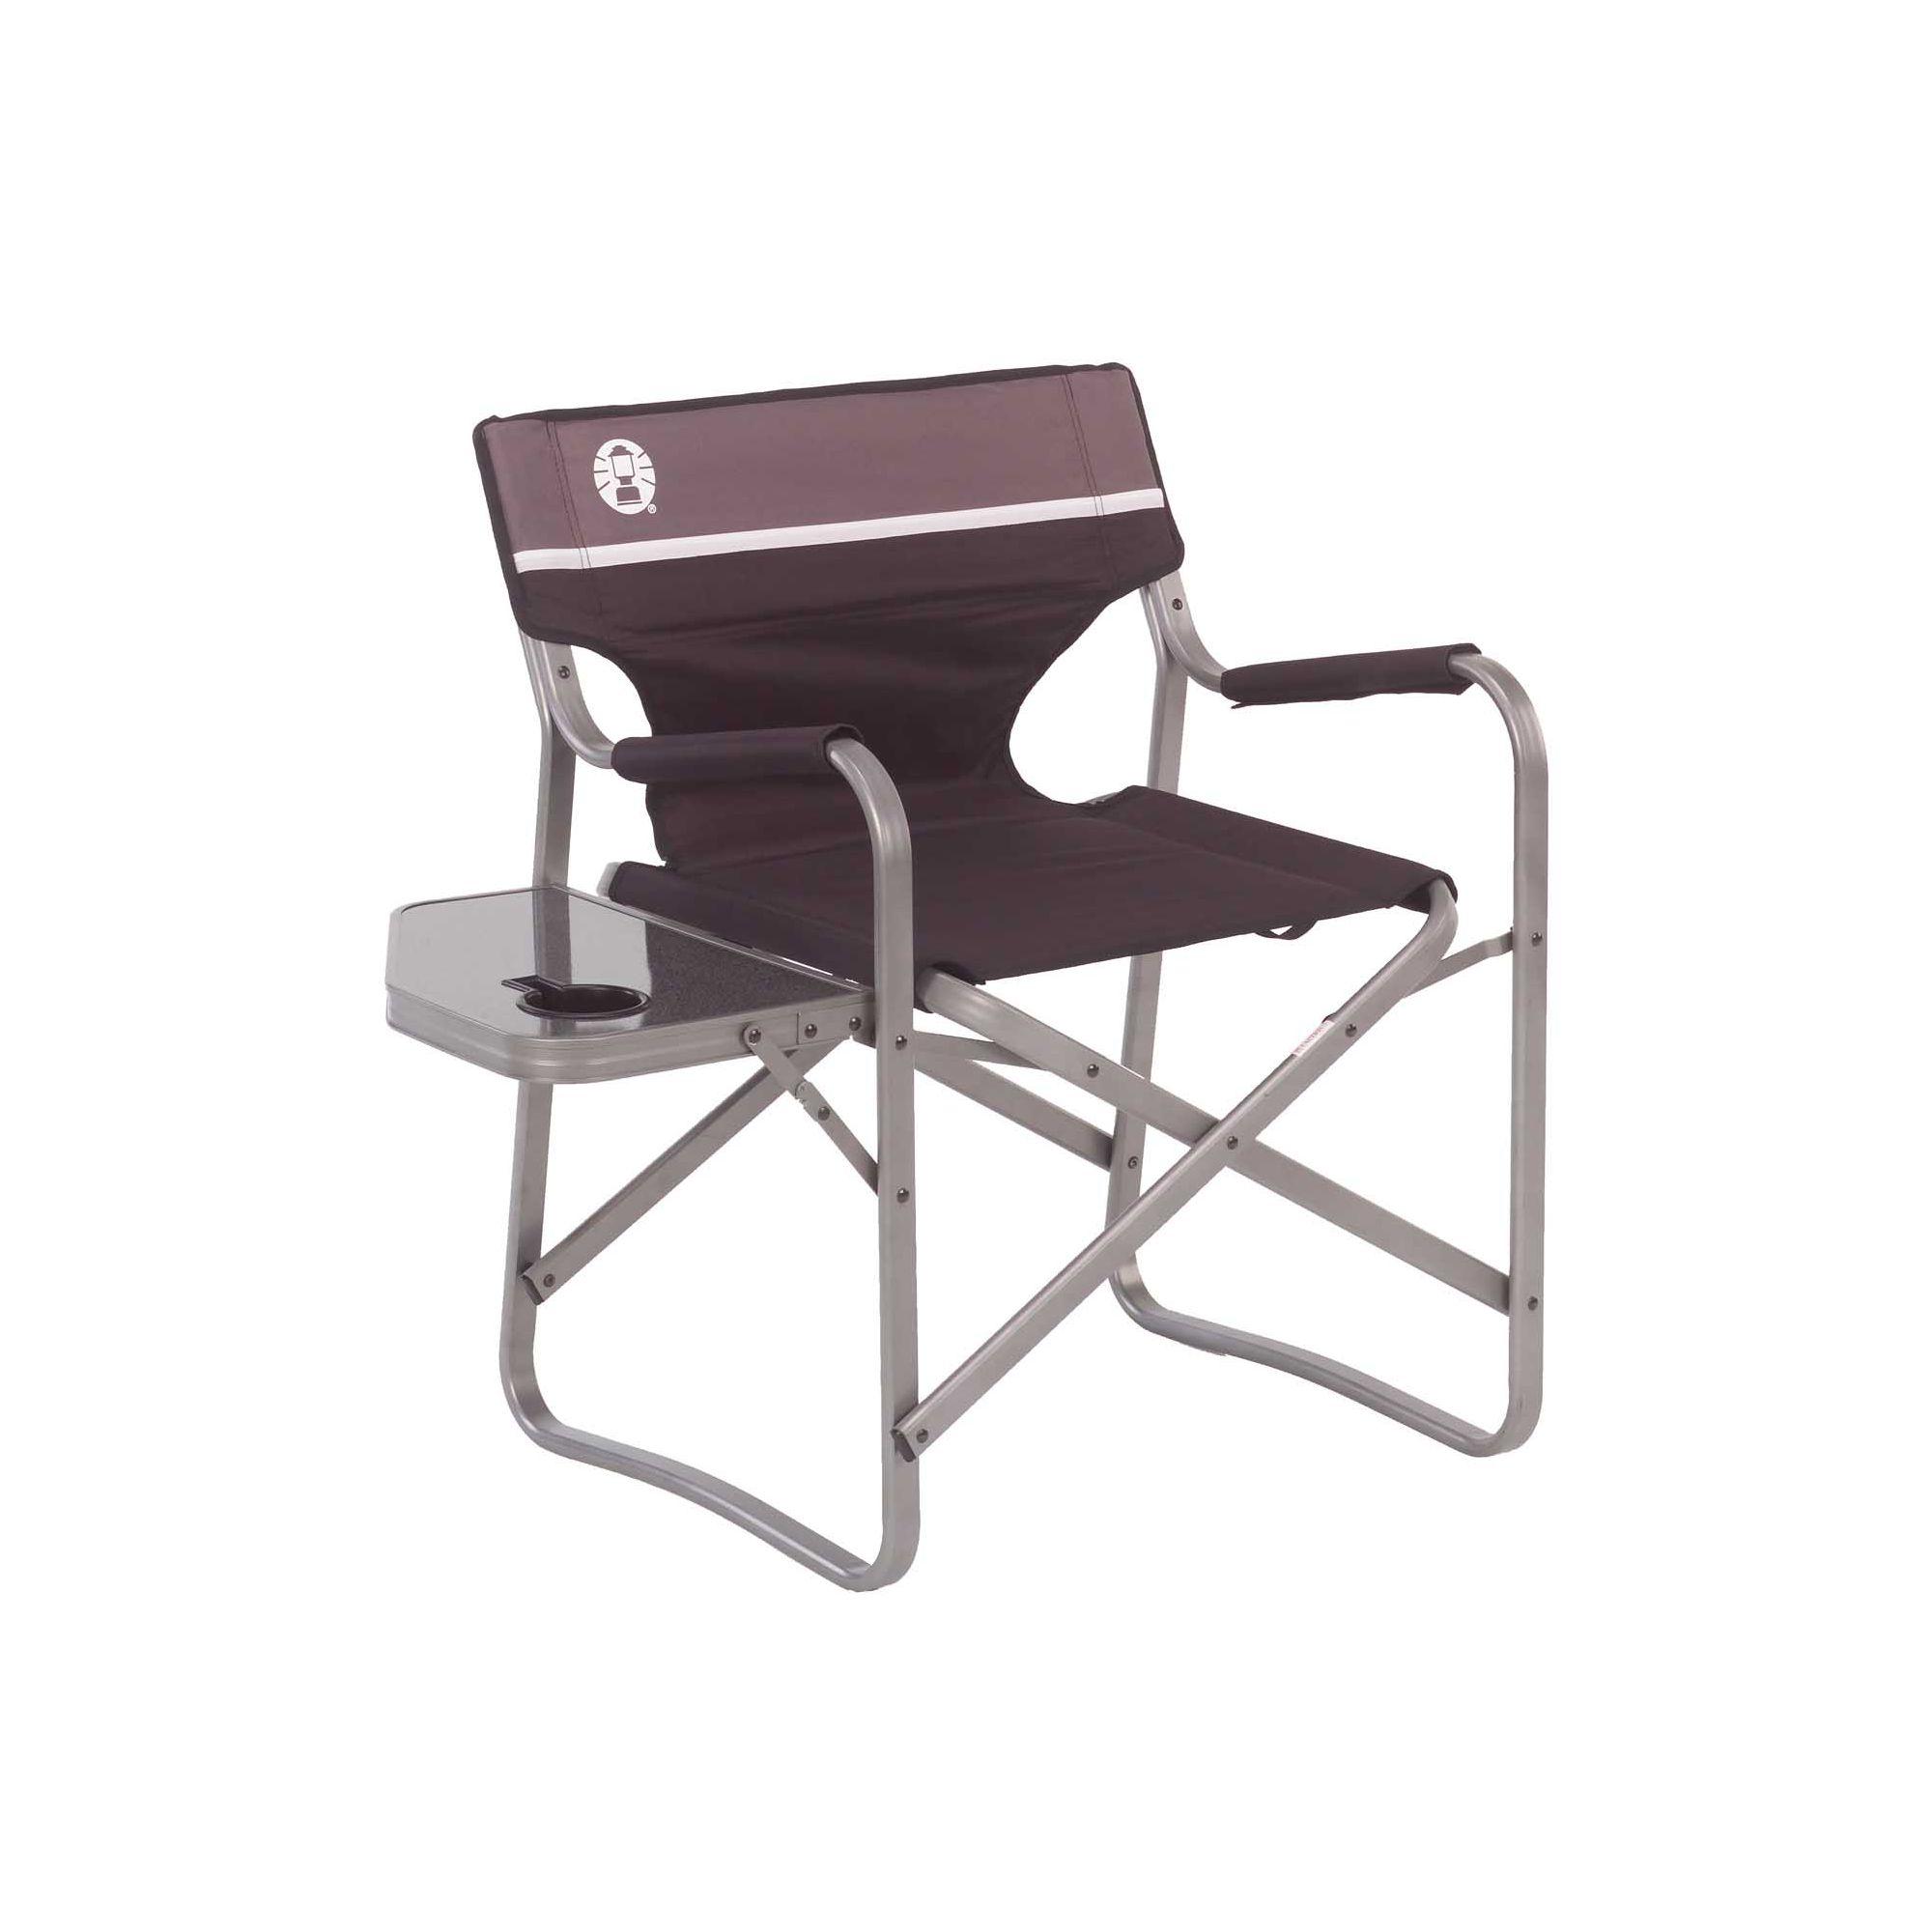 Silla plegable con mesa coleman elbunkker - Mesa plegable con sillas dentro ...